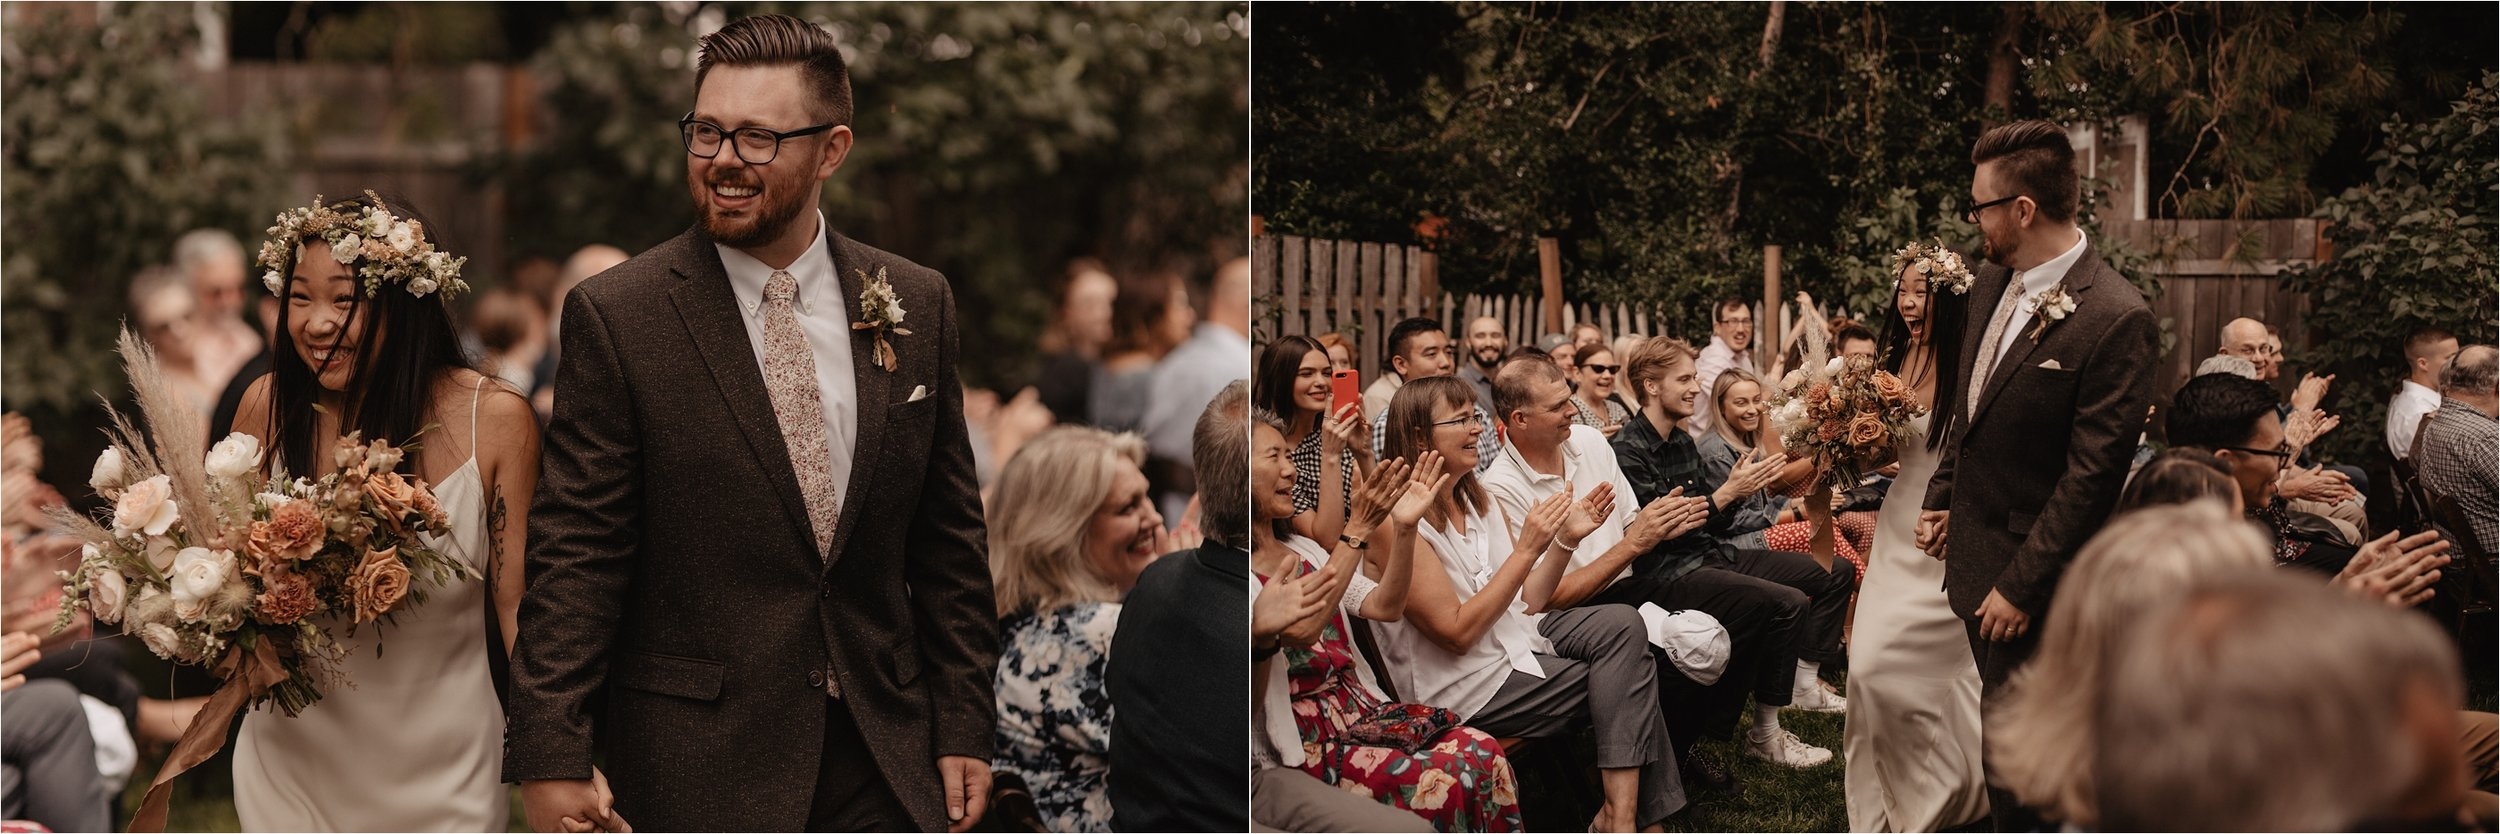 intimate-portland-modern-trendy-wedding_0083.jpg